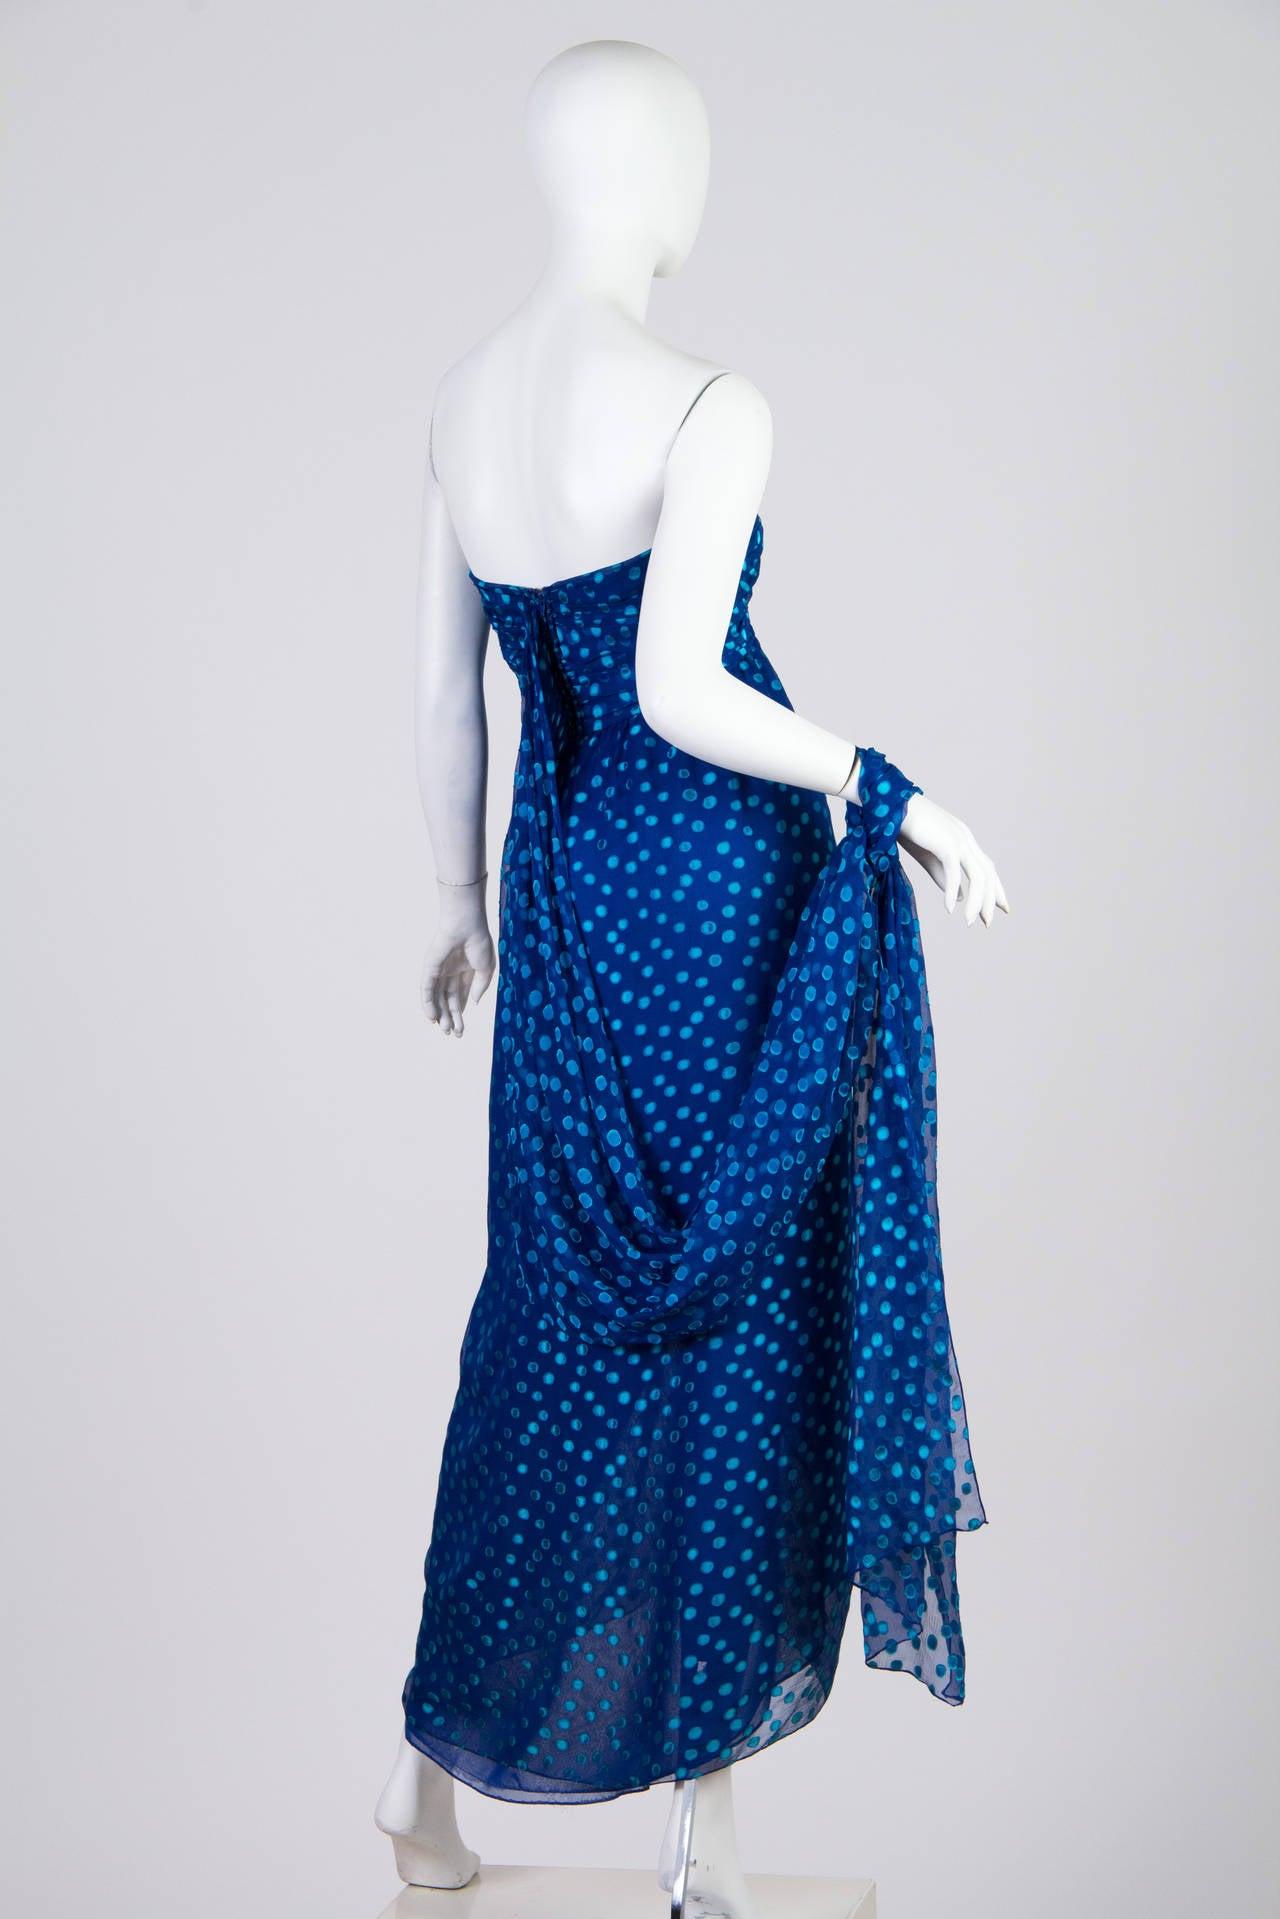 1970s Oscar de la Renta Chiffon Dress For Sale 3